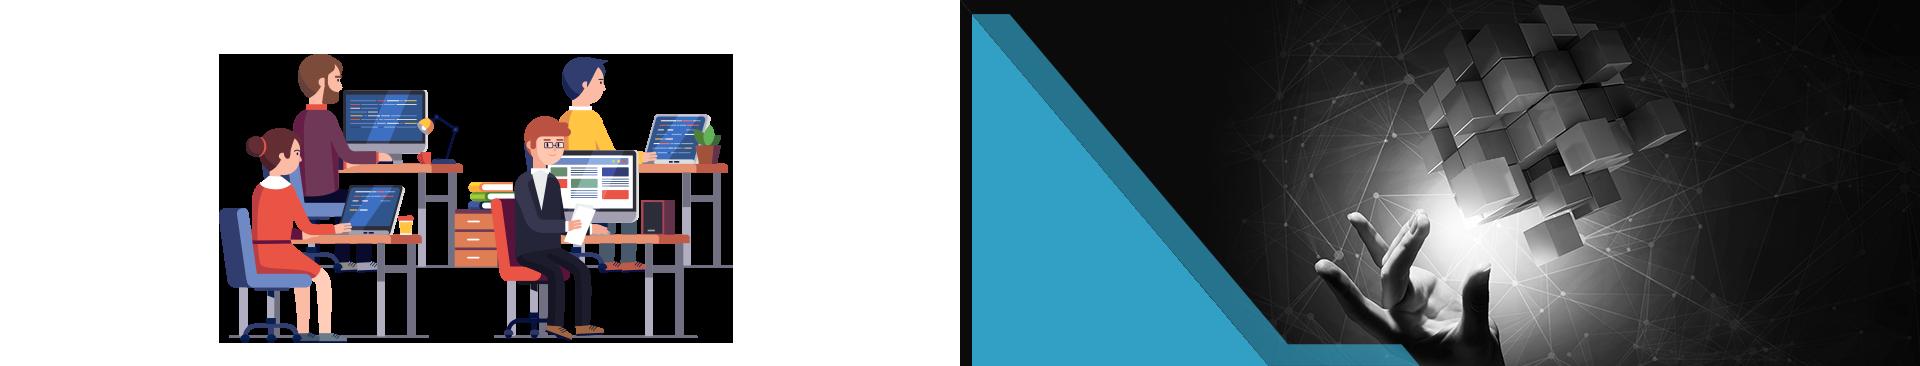 Remote Developer United States